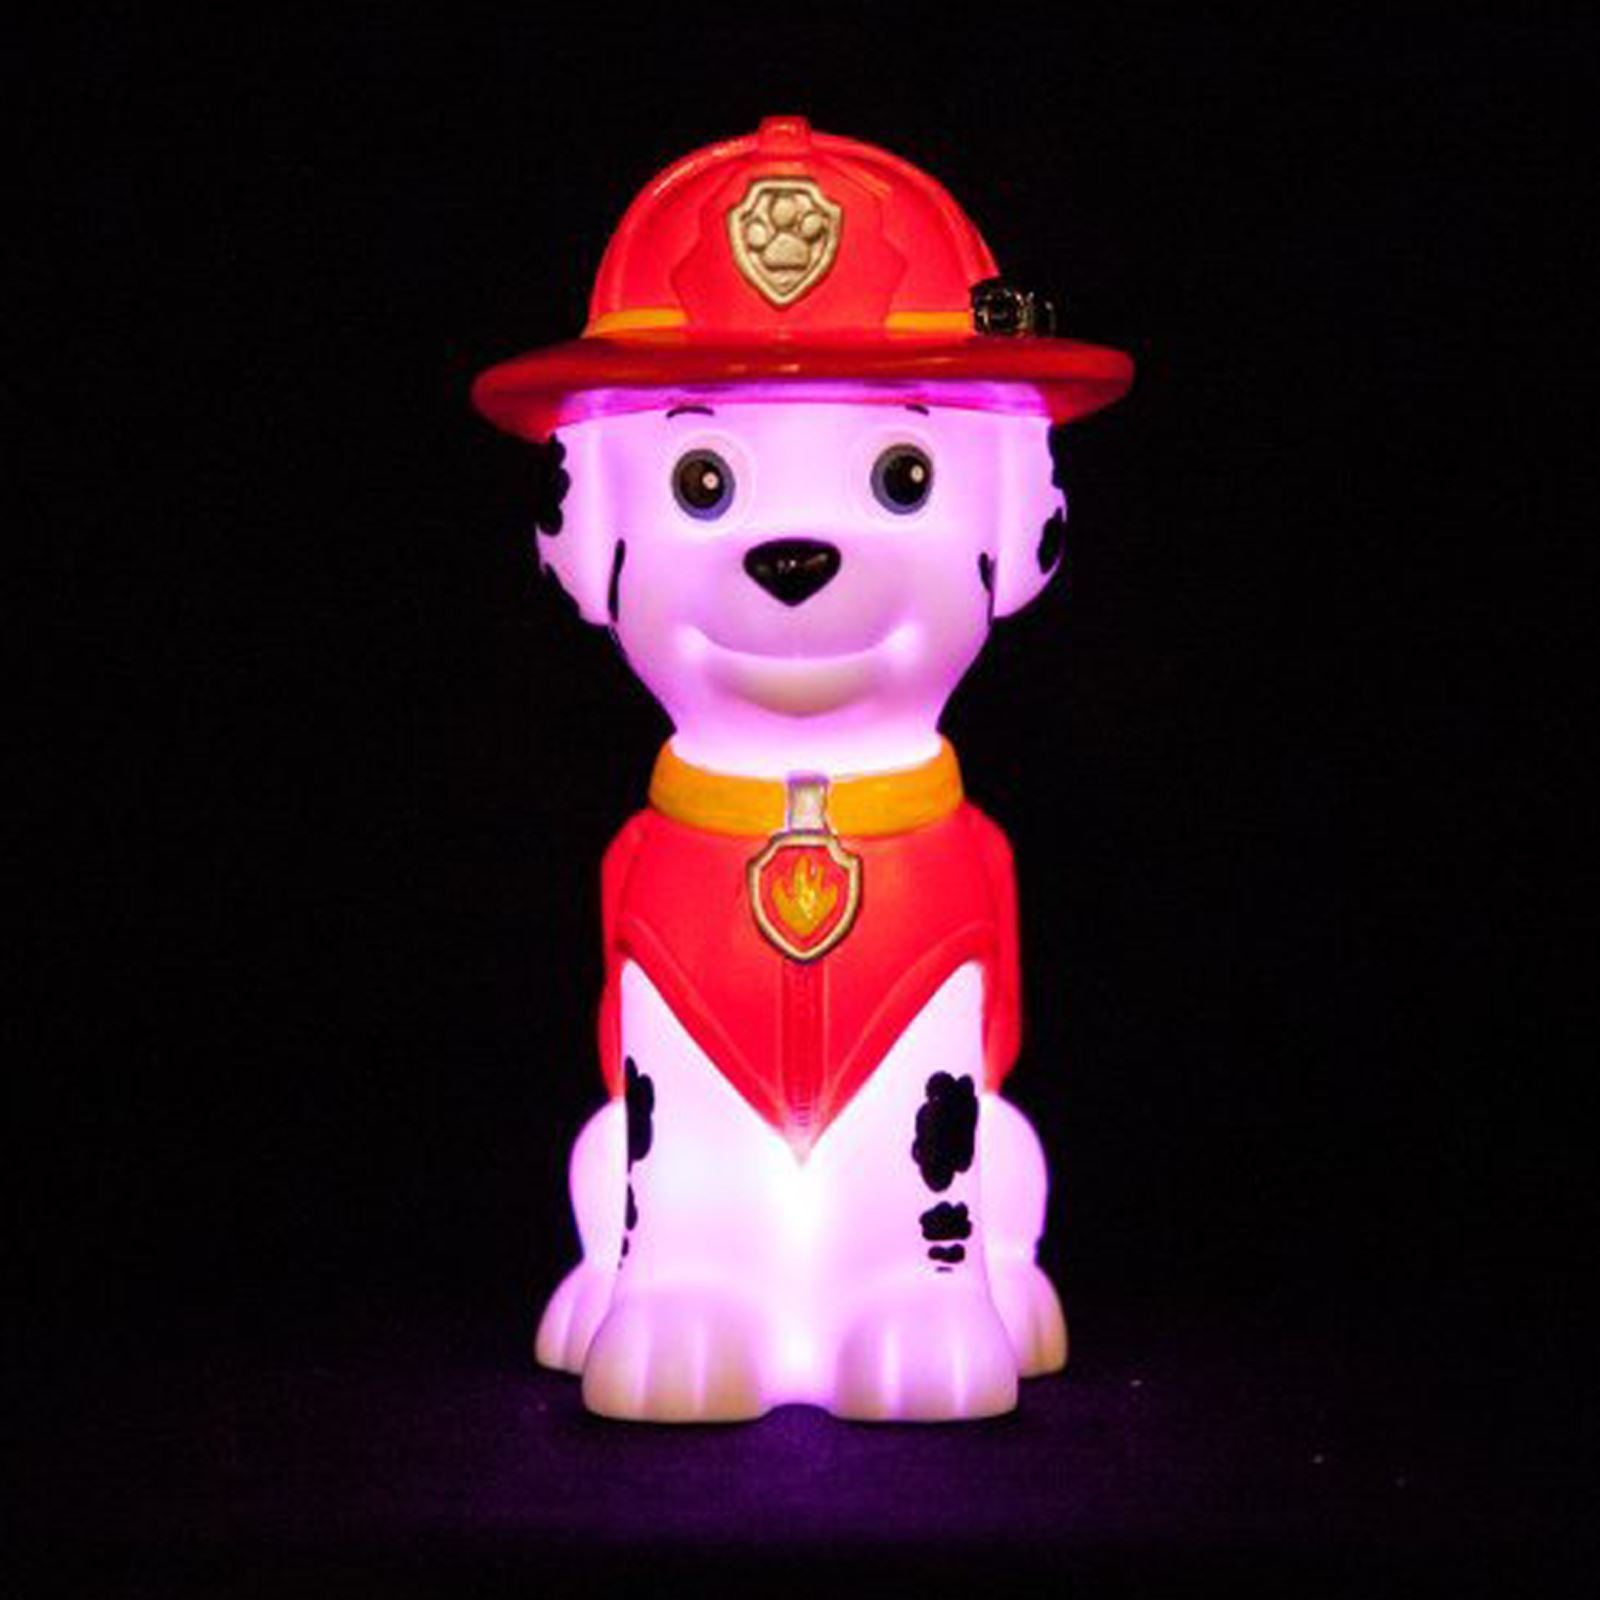 Paw Patrol Marshall The Dog Led Illumi Mate Night Light